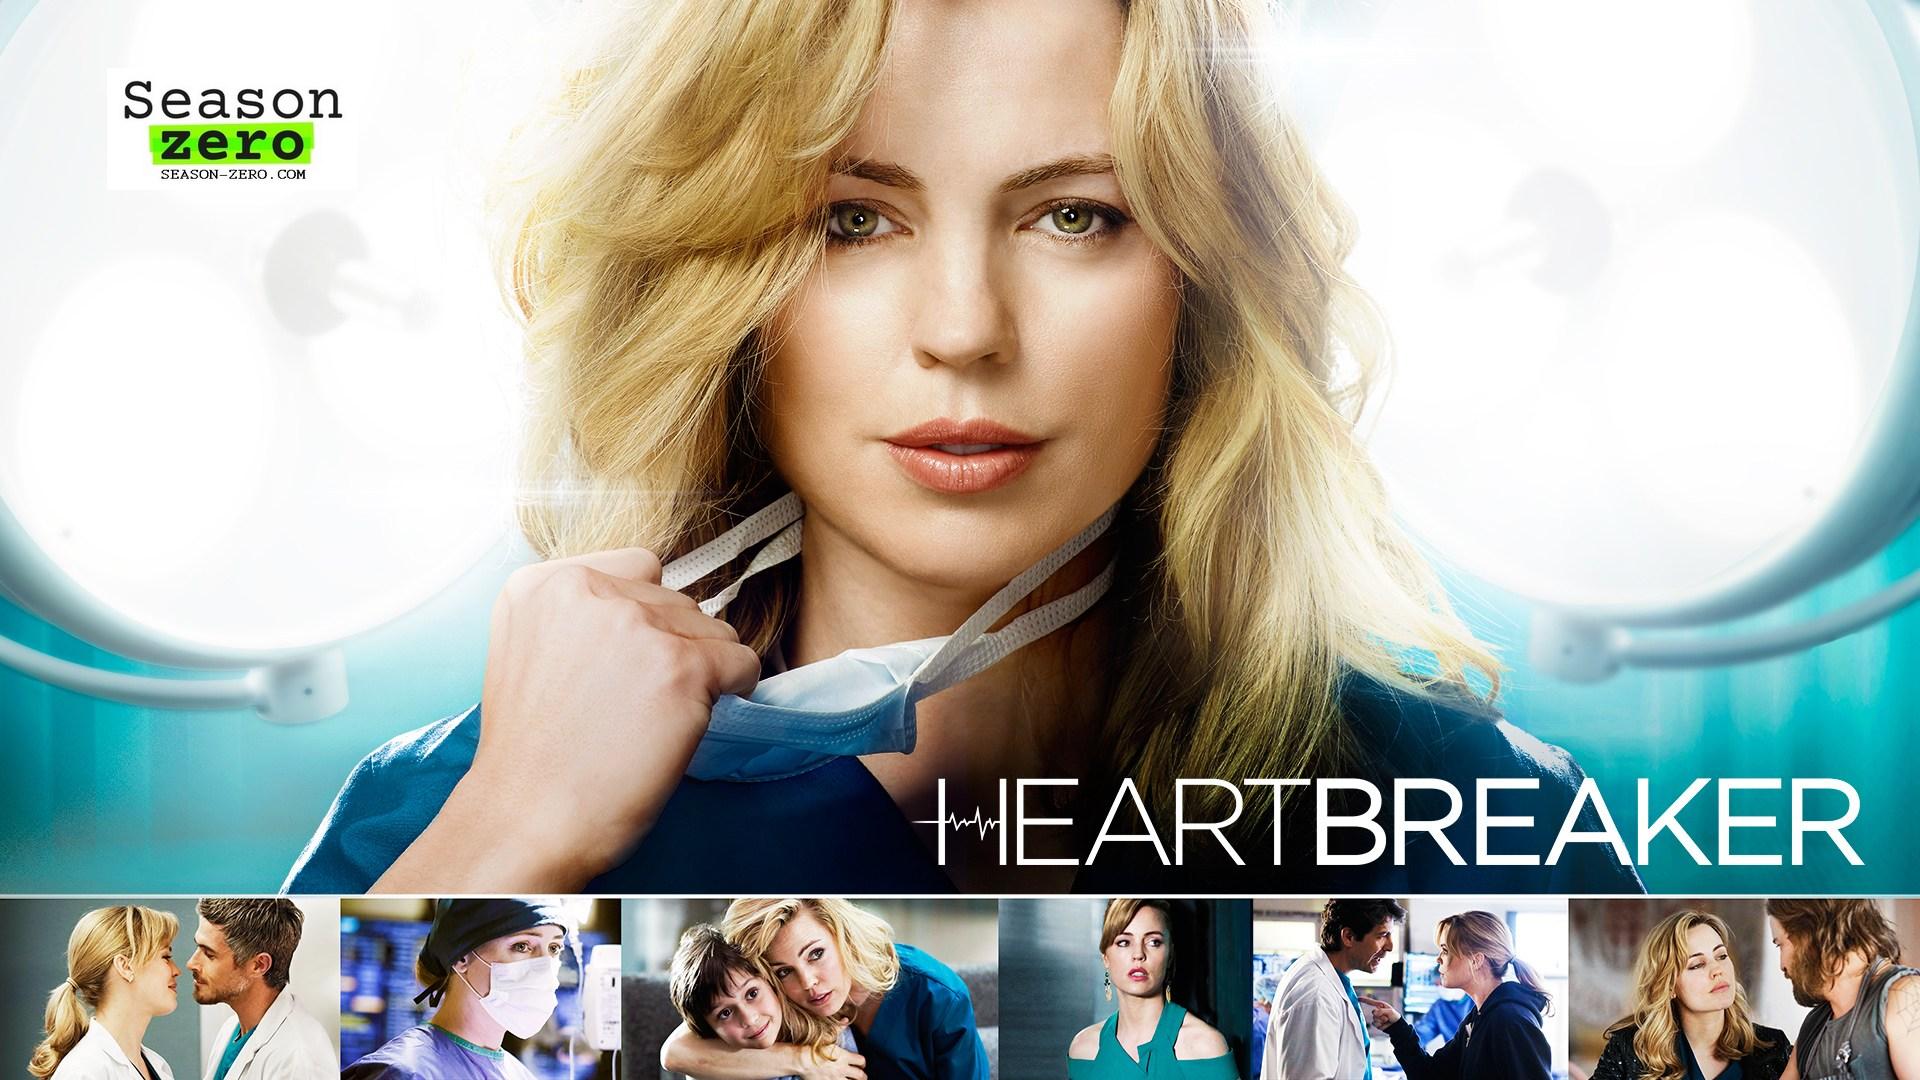 NBC's Heartbreaker